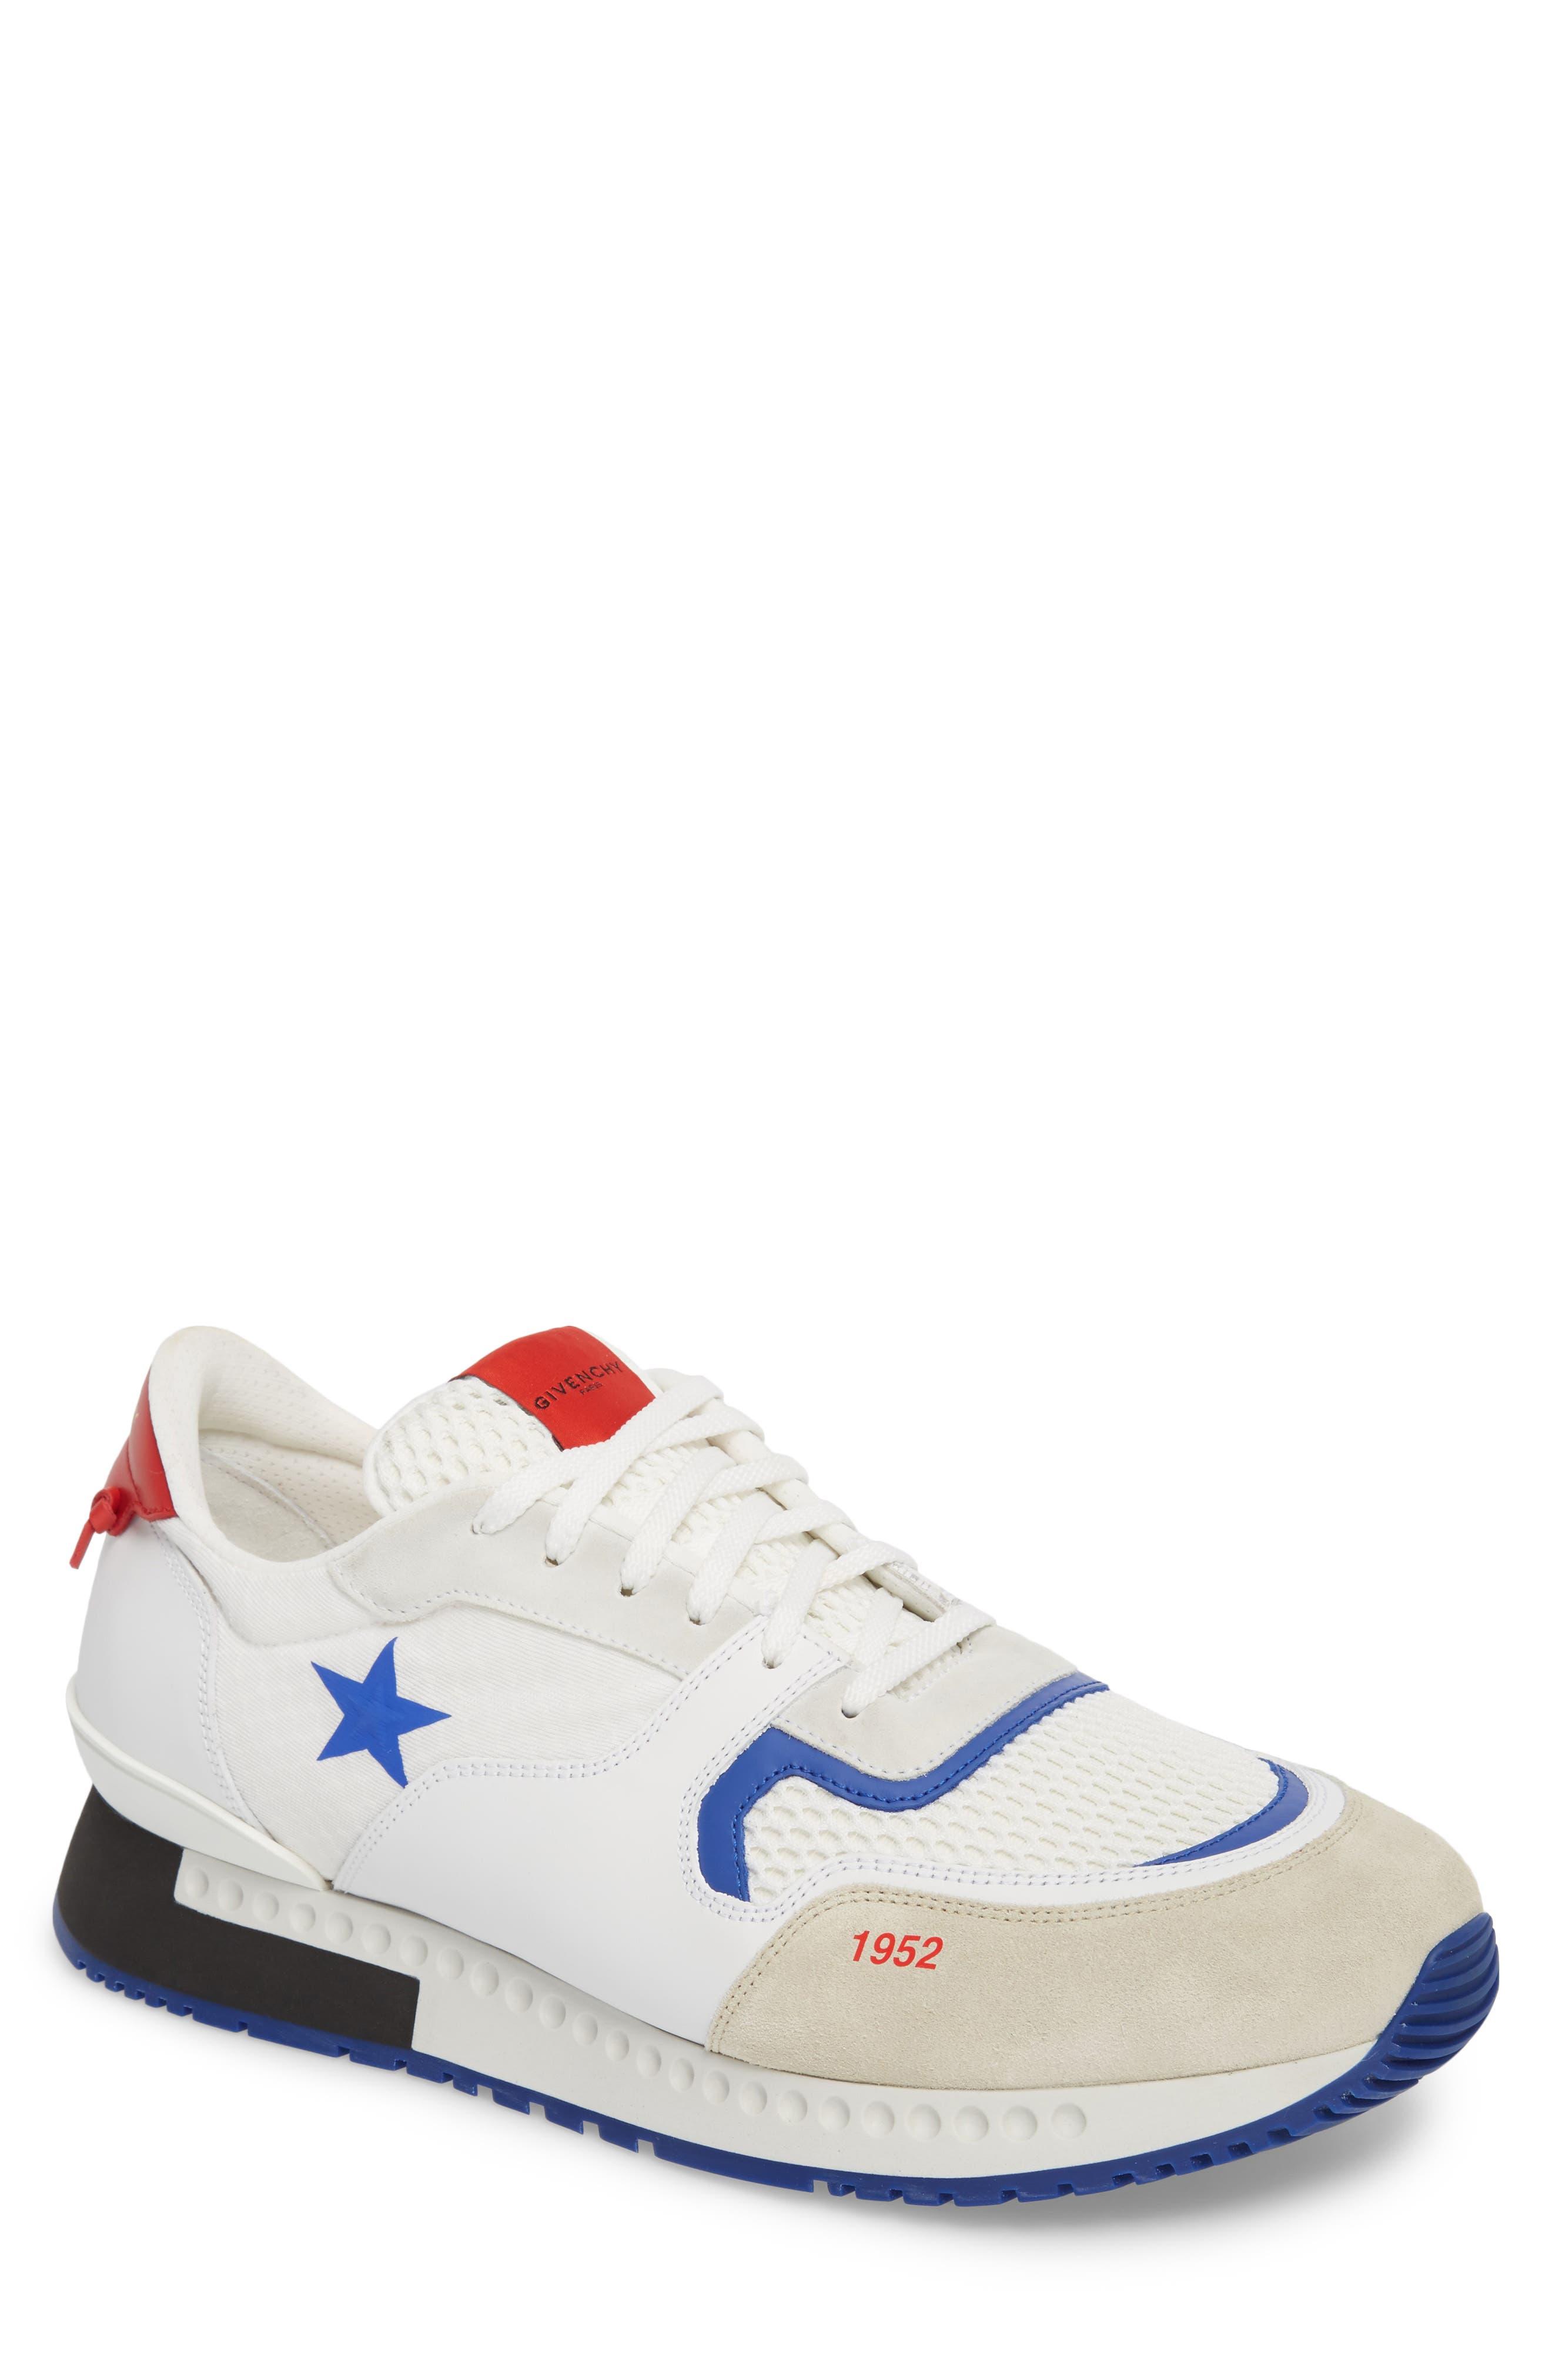 1952 Star Active Runner Sneaker,                         Main,                         color, 112